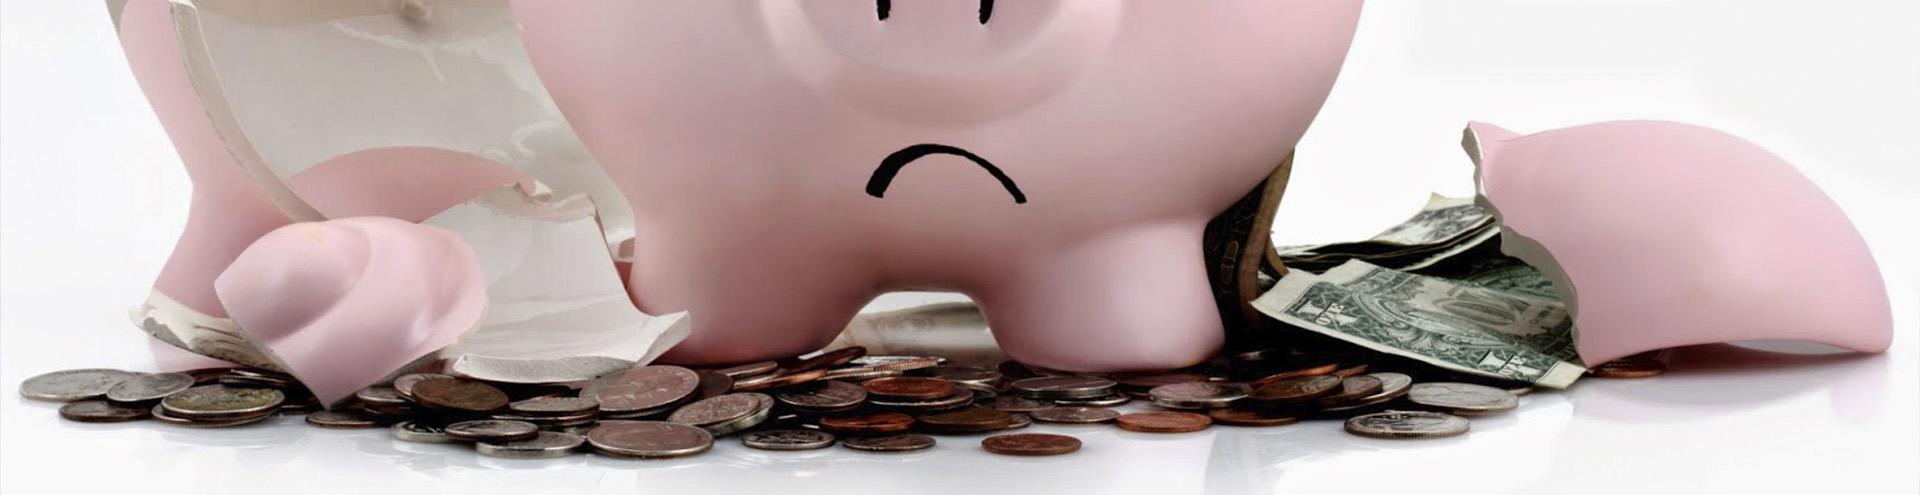 банкротство банка в Чебоксарах